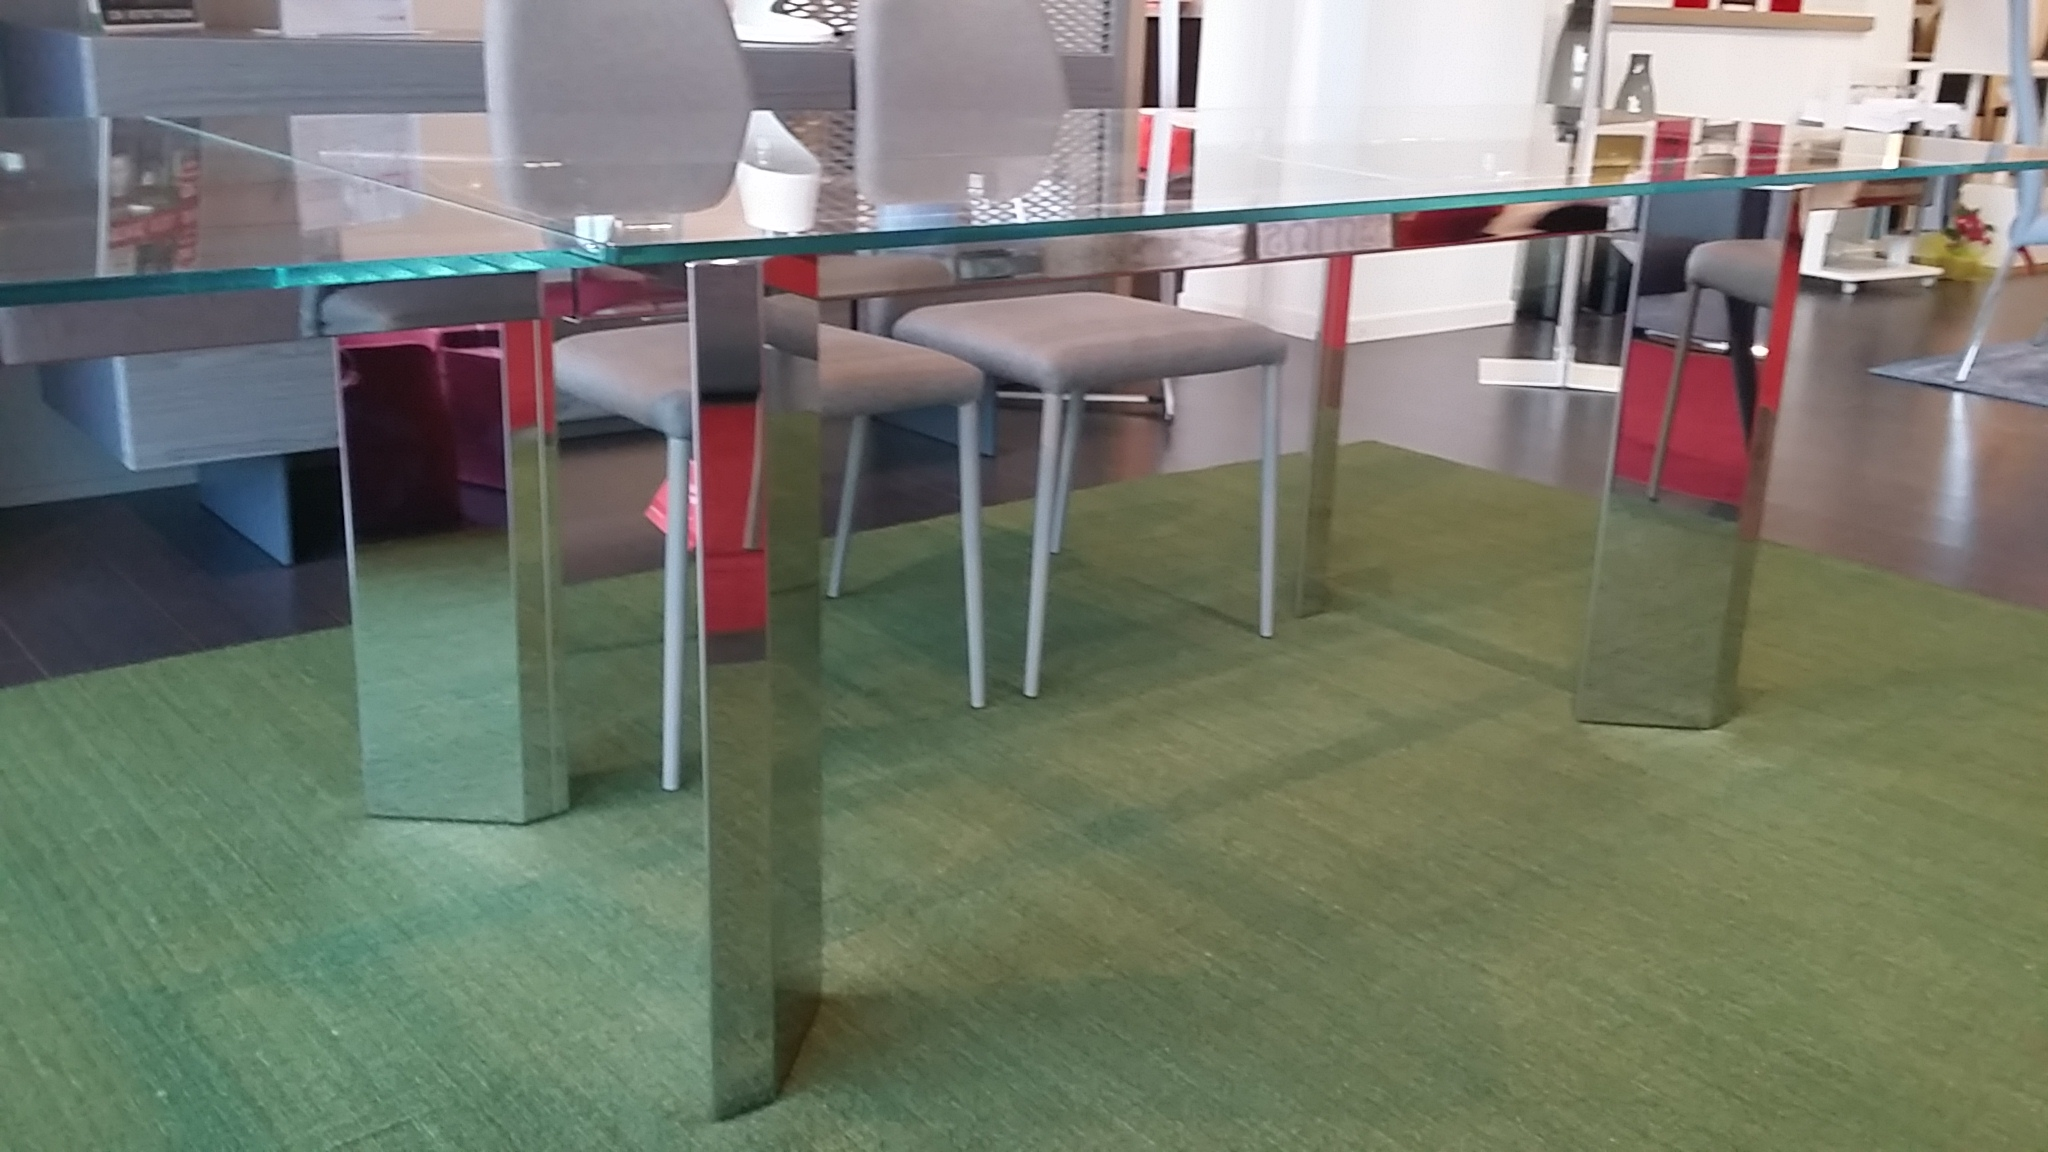 Offerta tavolo calligaris tower tavoli a prezzi scontati for Offerte tavoli calligaris